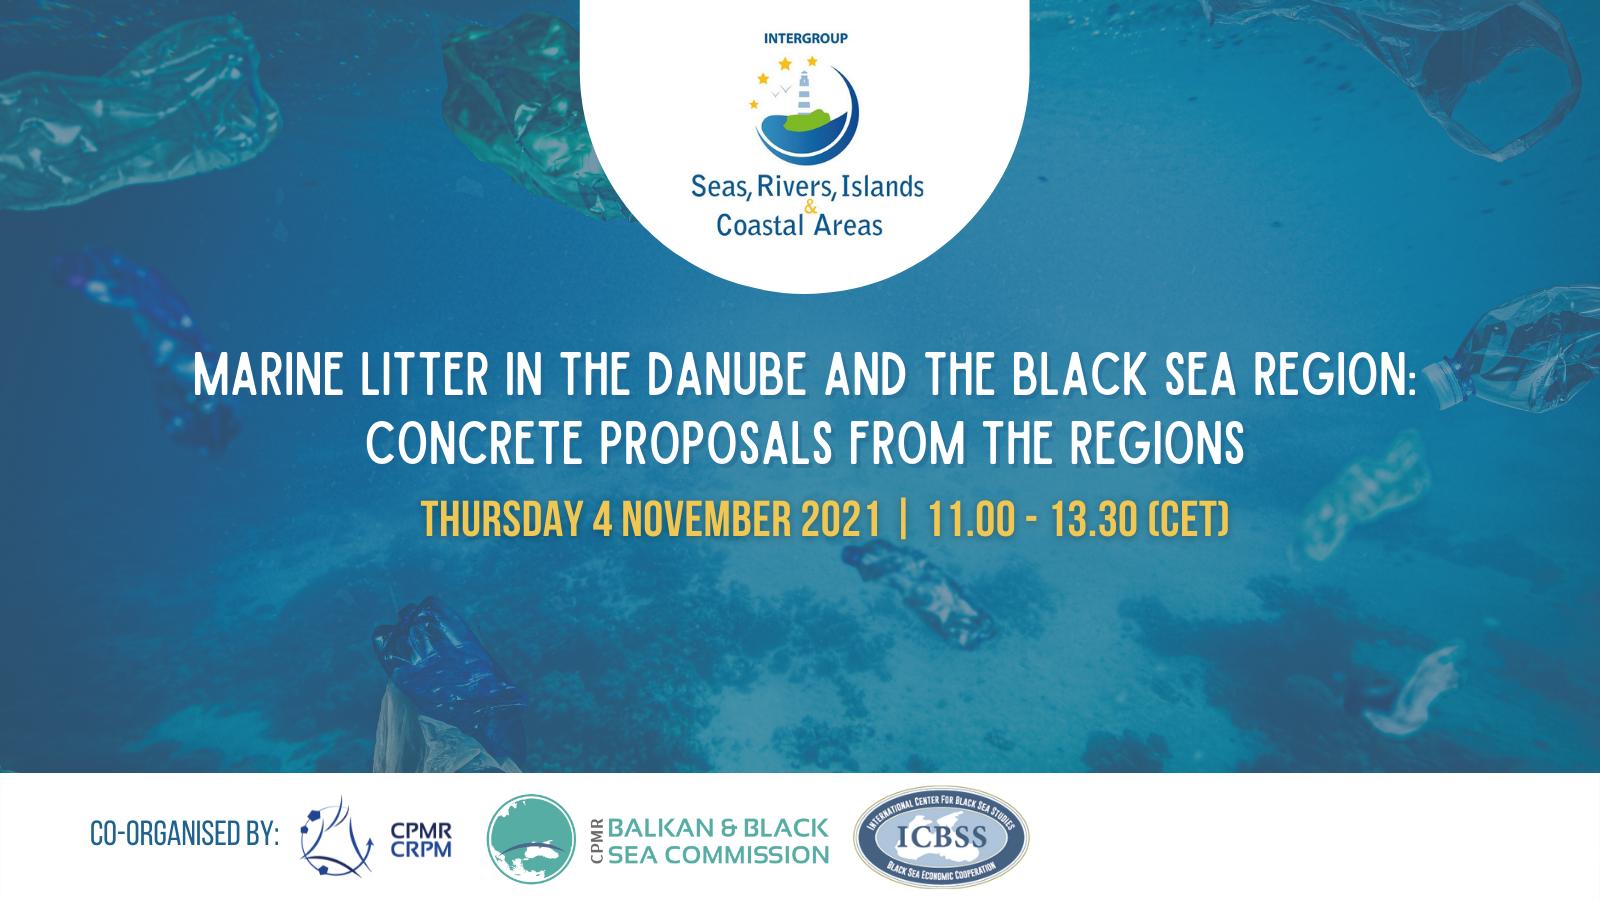 SEArica_Poster_Marine_Litter_Danube_Black_Sea_3108